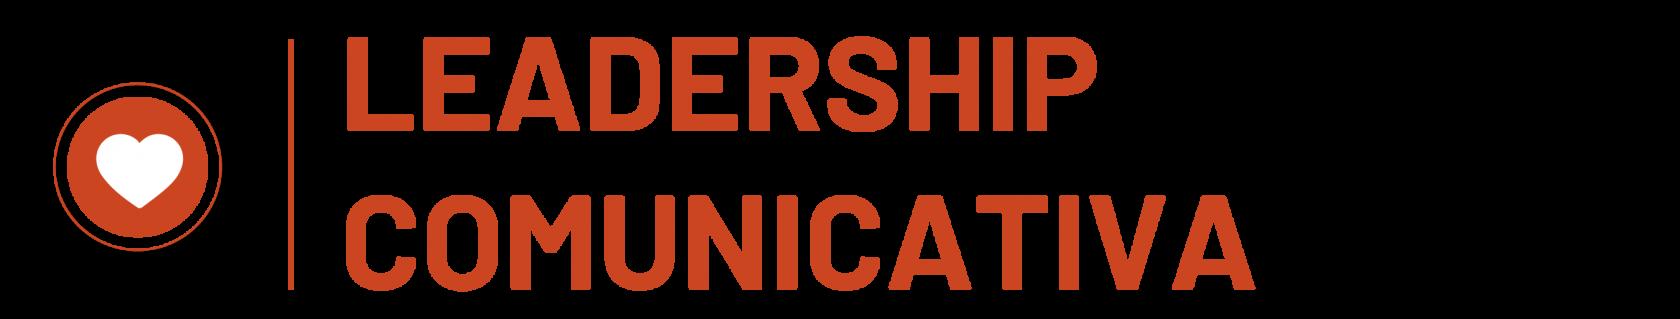 Header LEADERSHIPCOMUNICATIVAcerchio-01